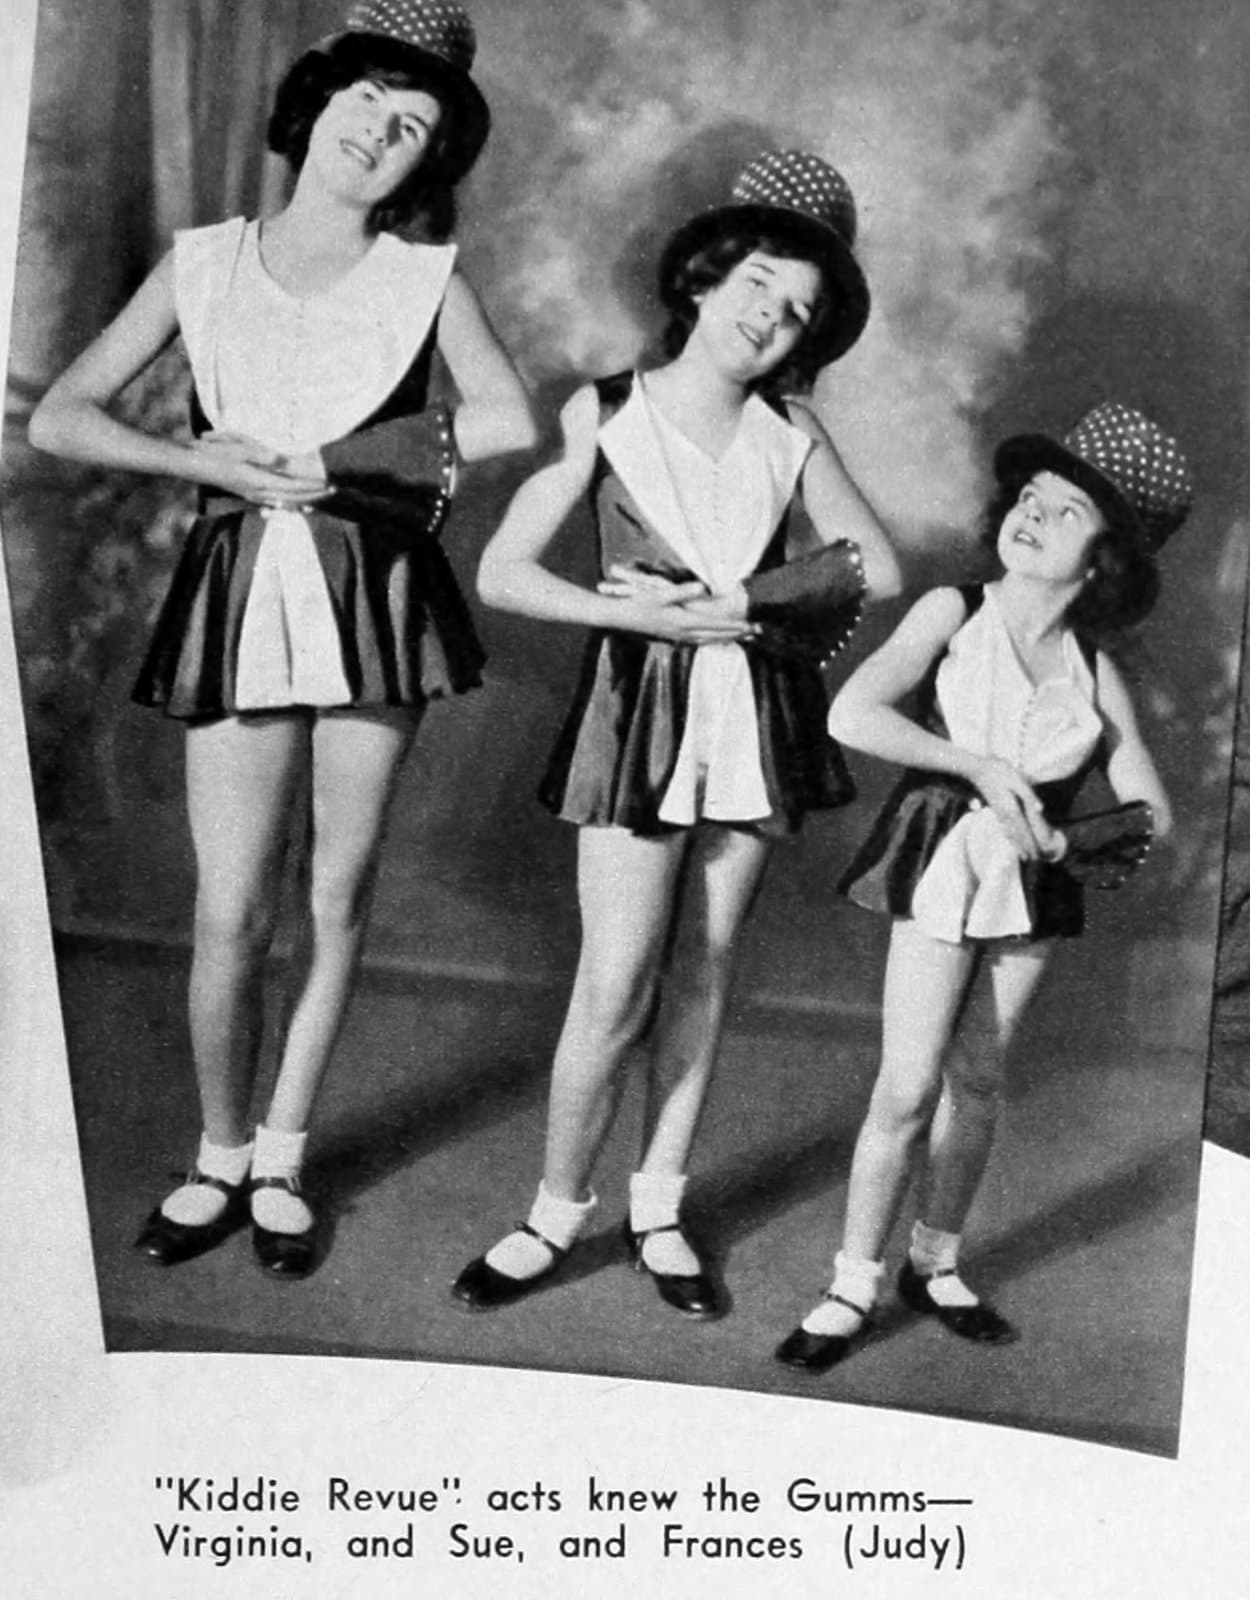 Judy Garland story - Gumm Sisters